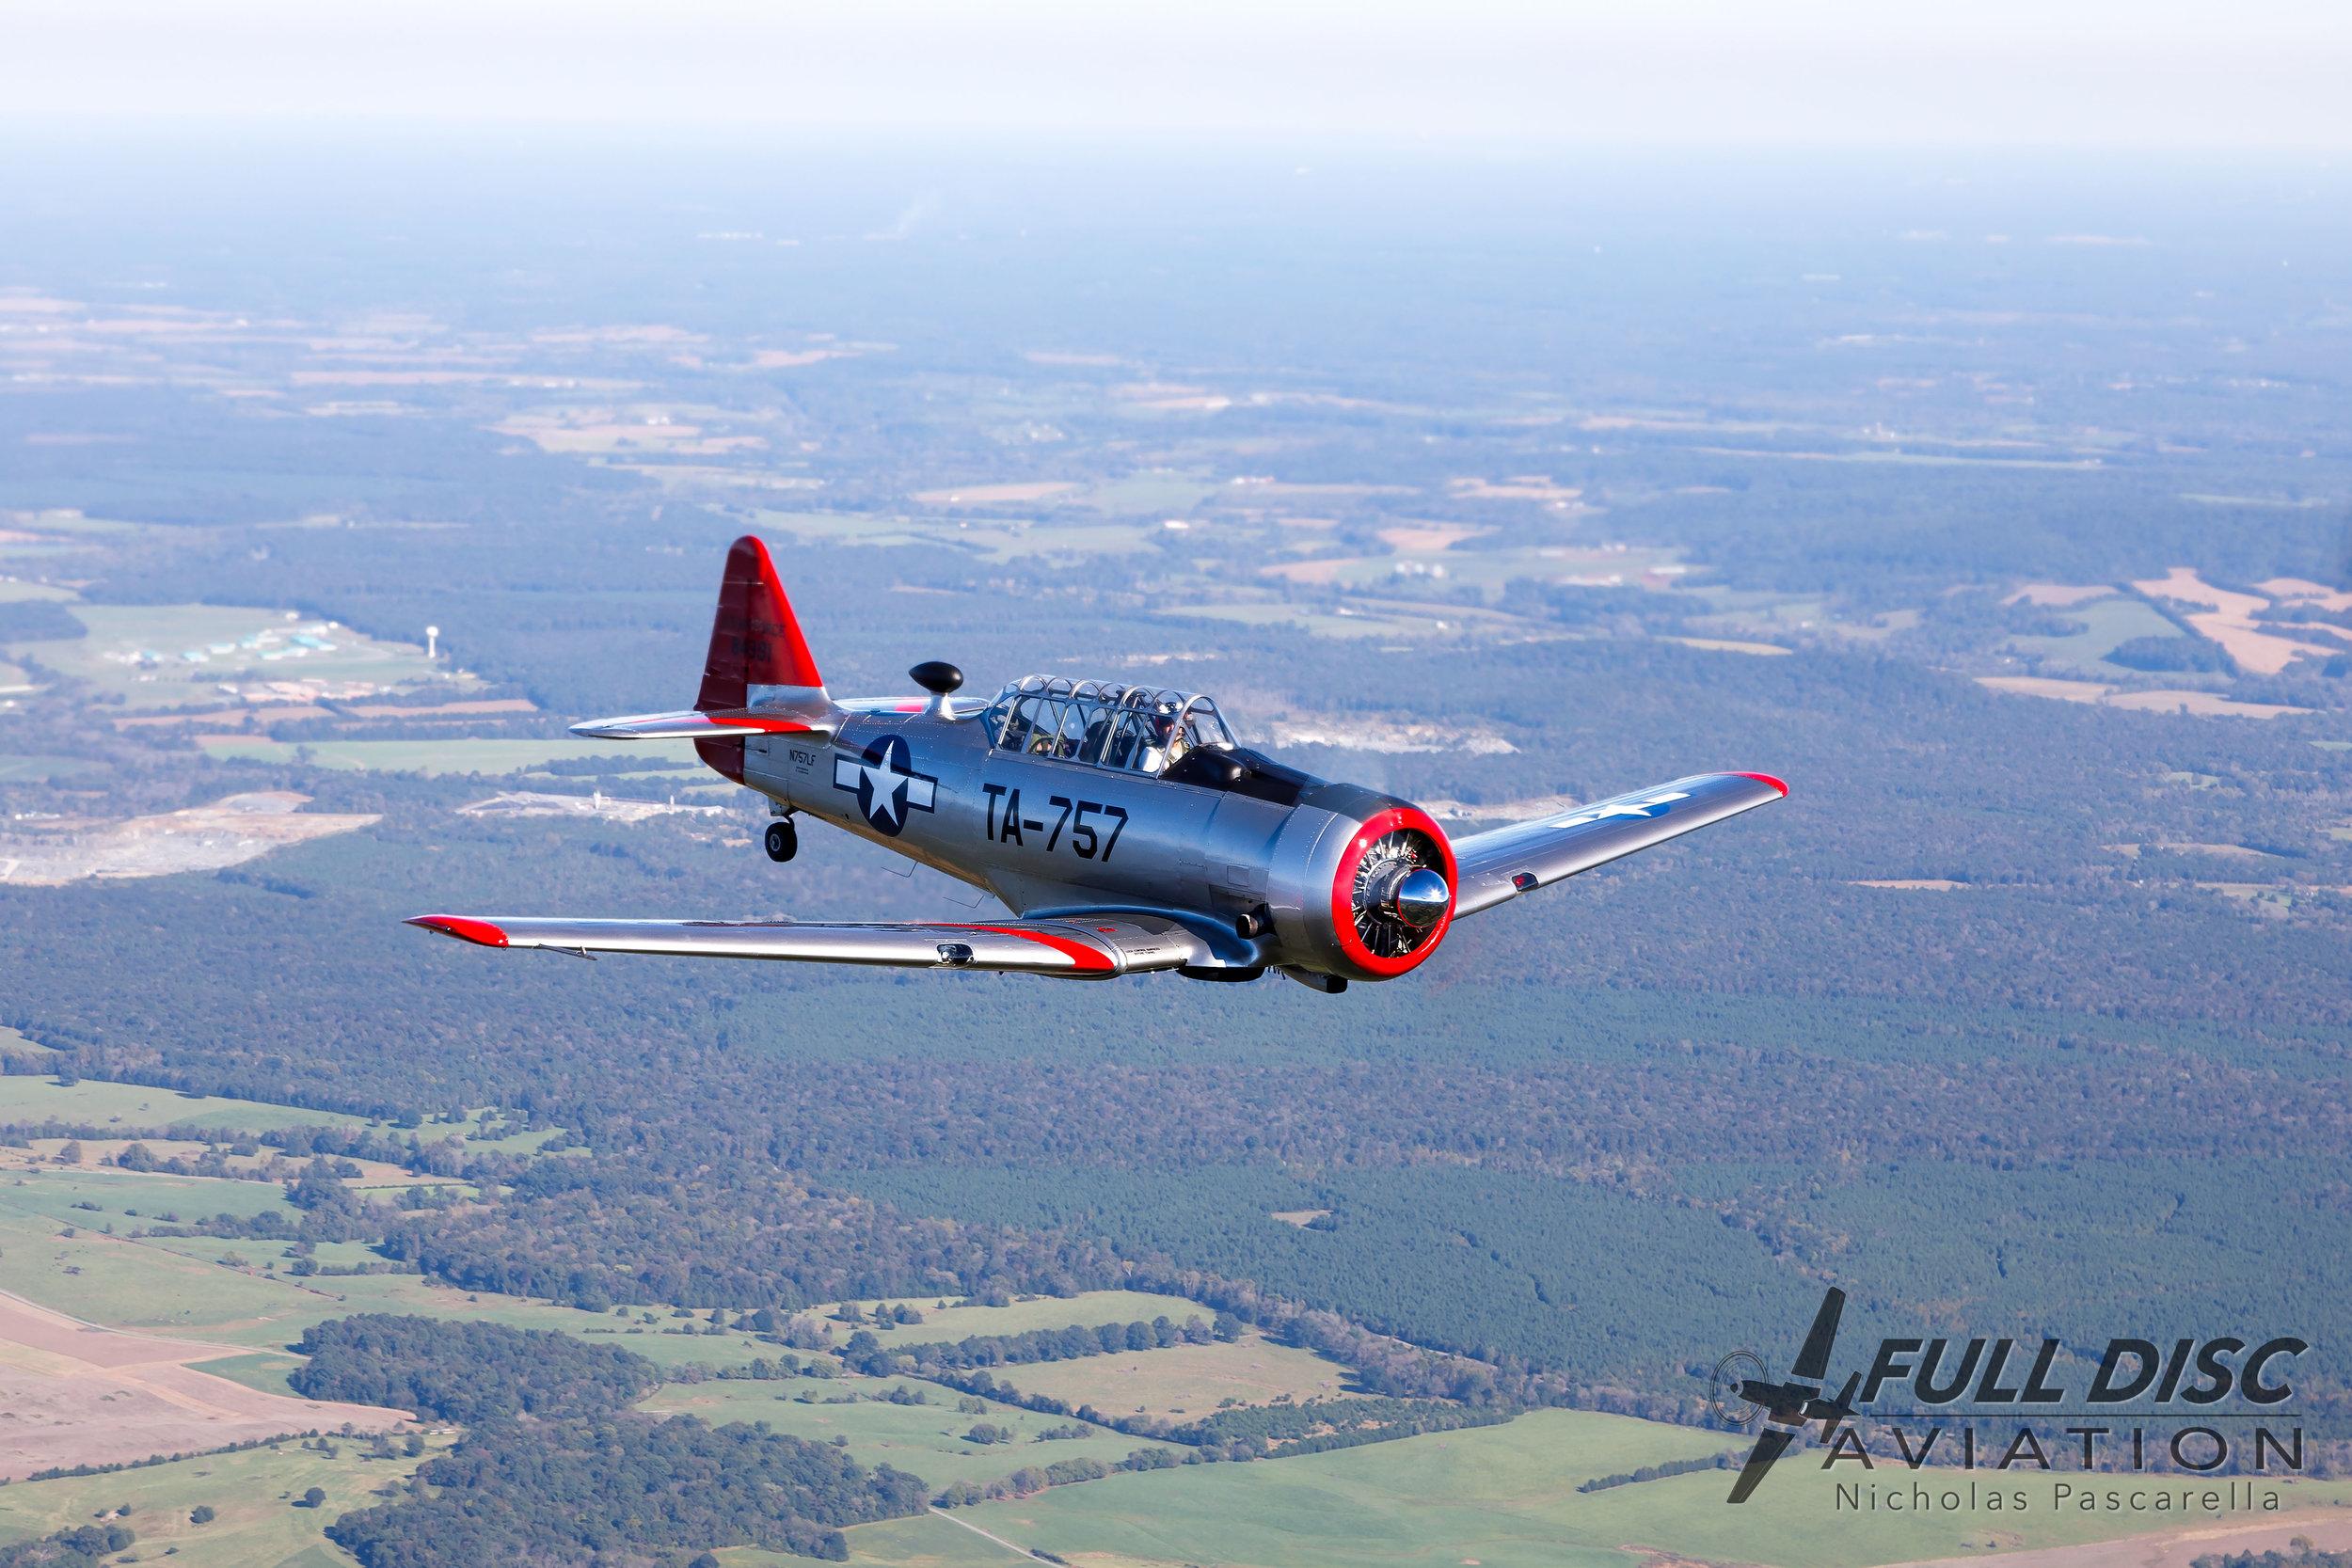 T6_full_disc_aviation_a2a_flying.jpg